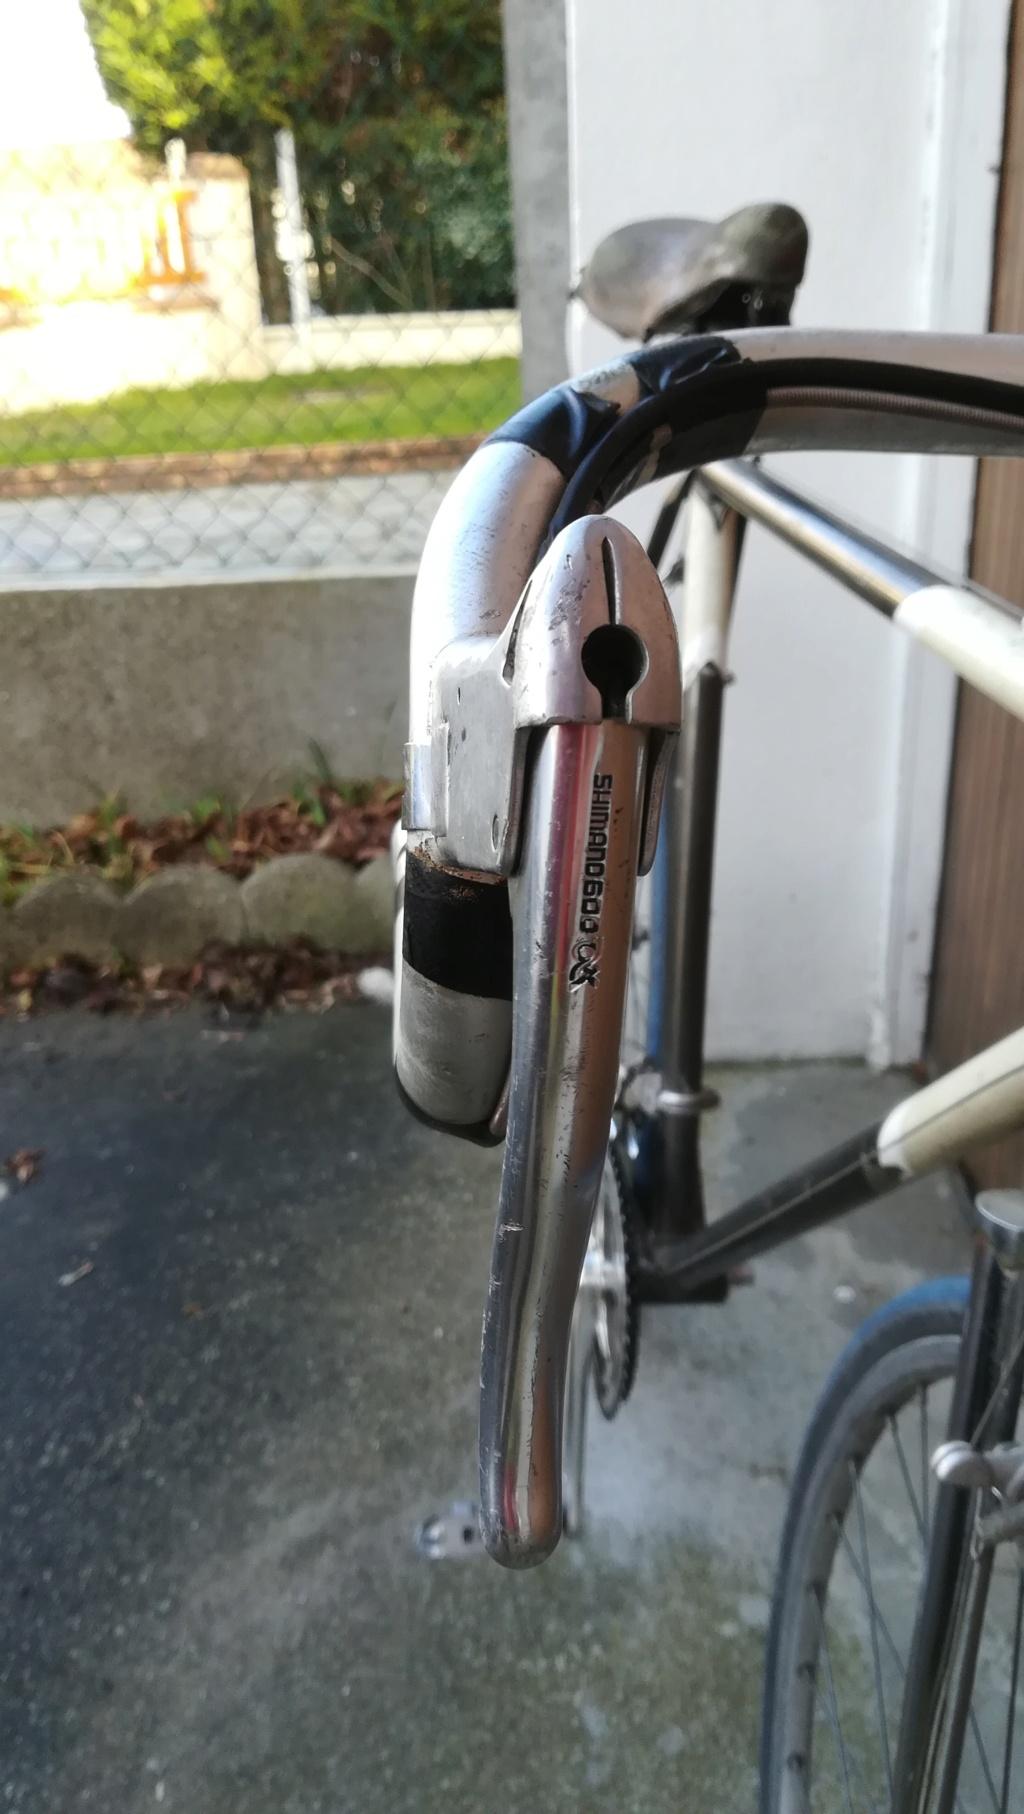 Cyclo cross inconnu  Img_2104